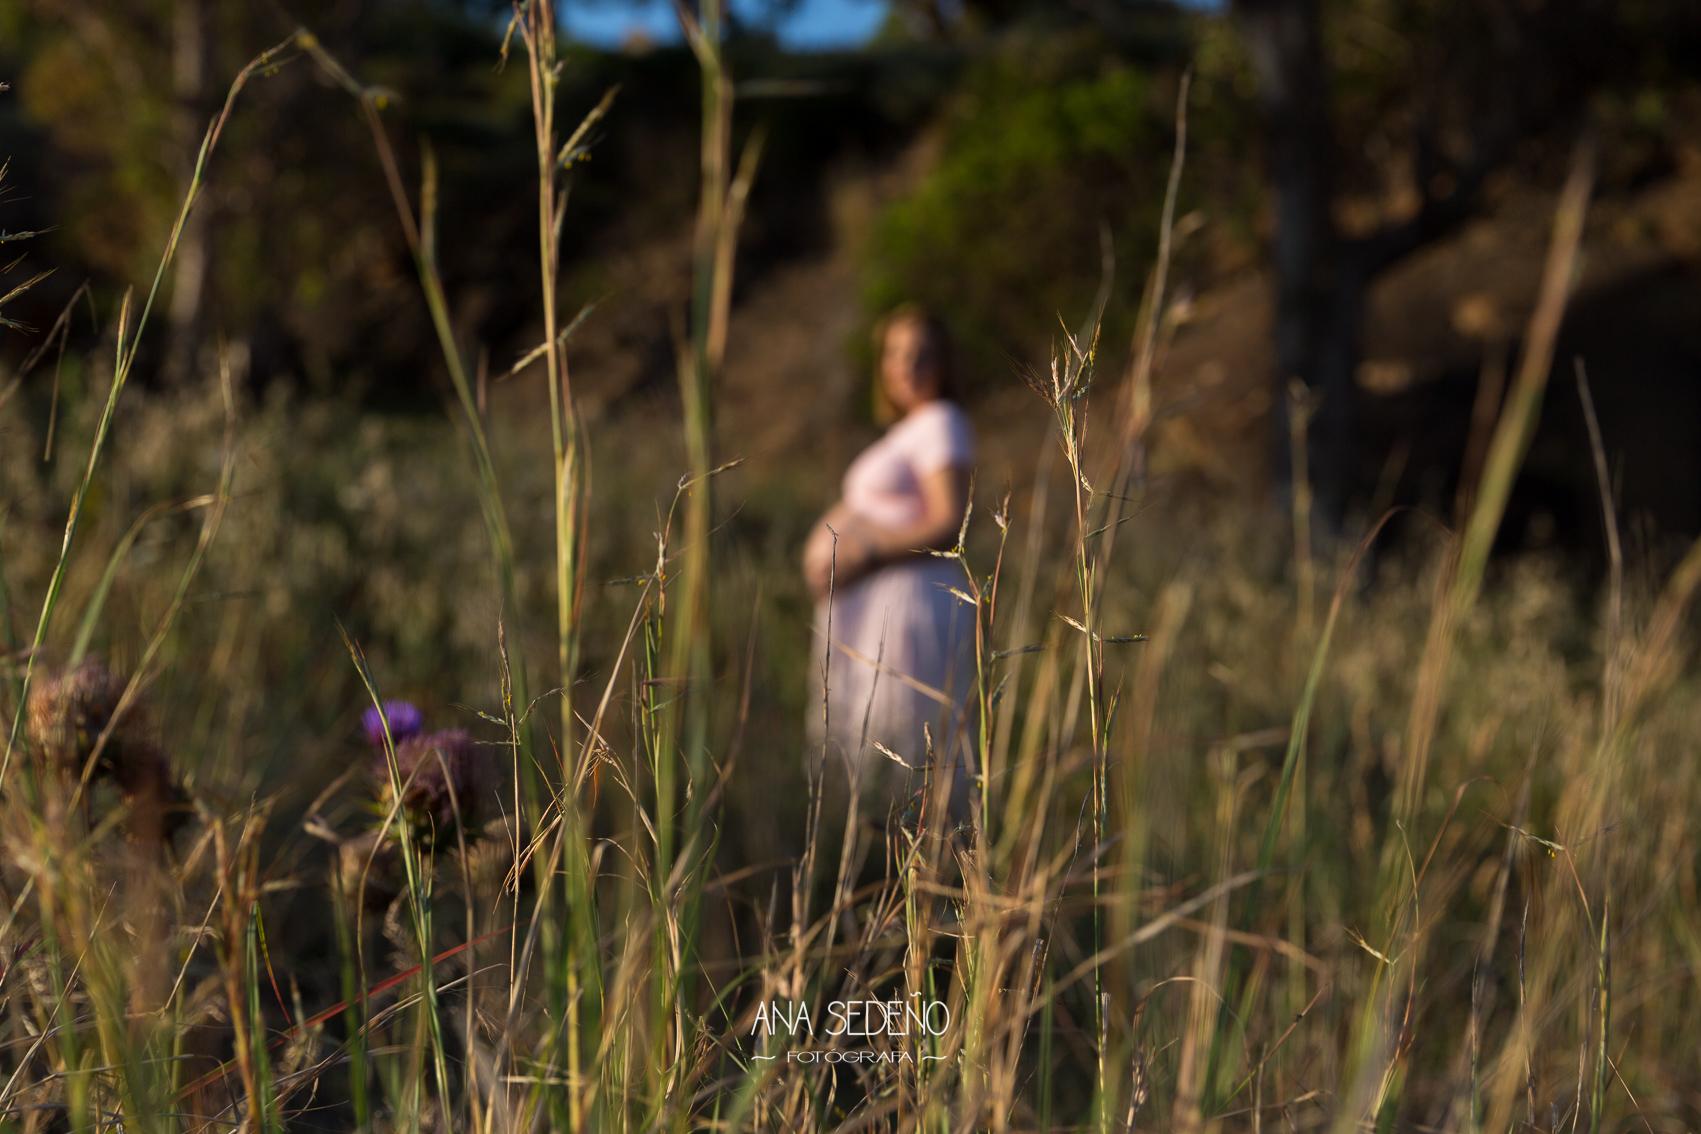 Ana Sedeño Fotografa.-MJose-0170